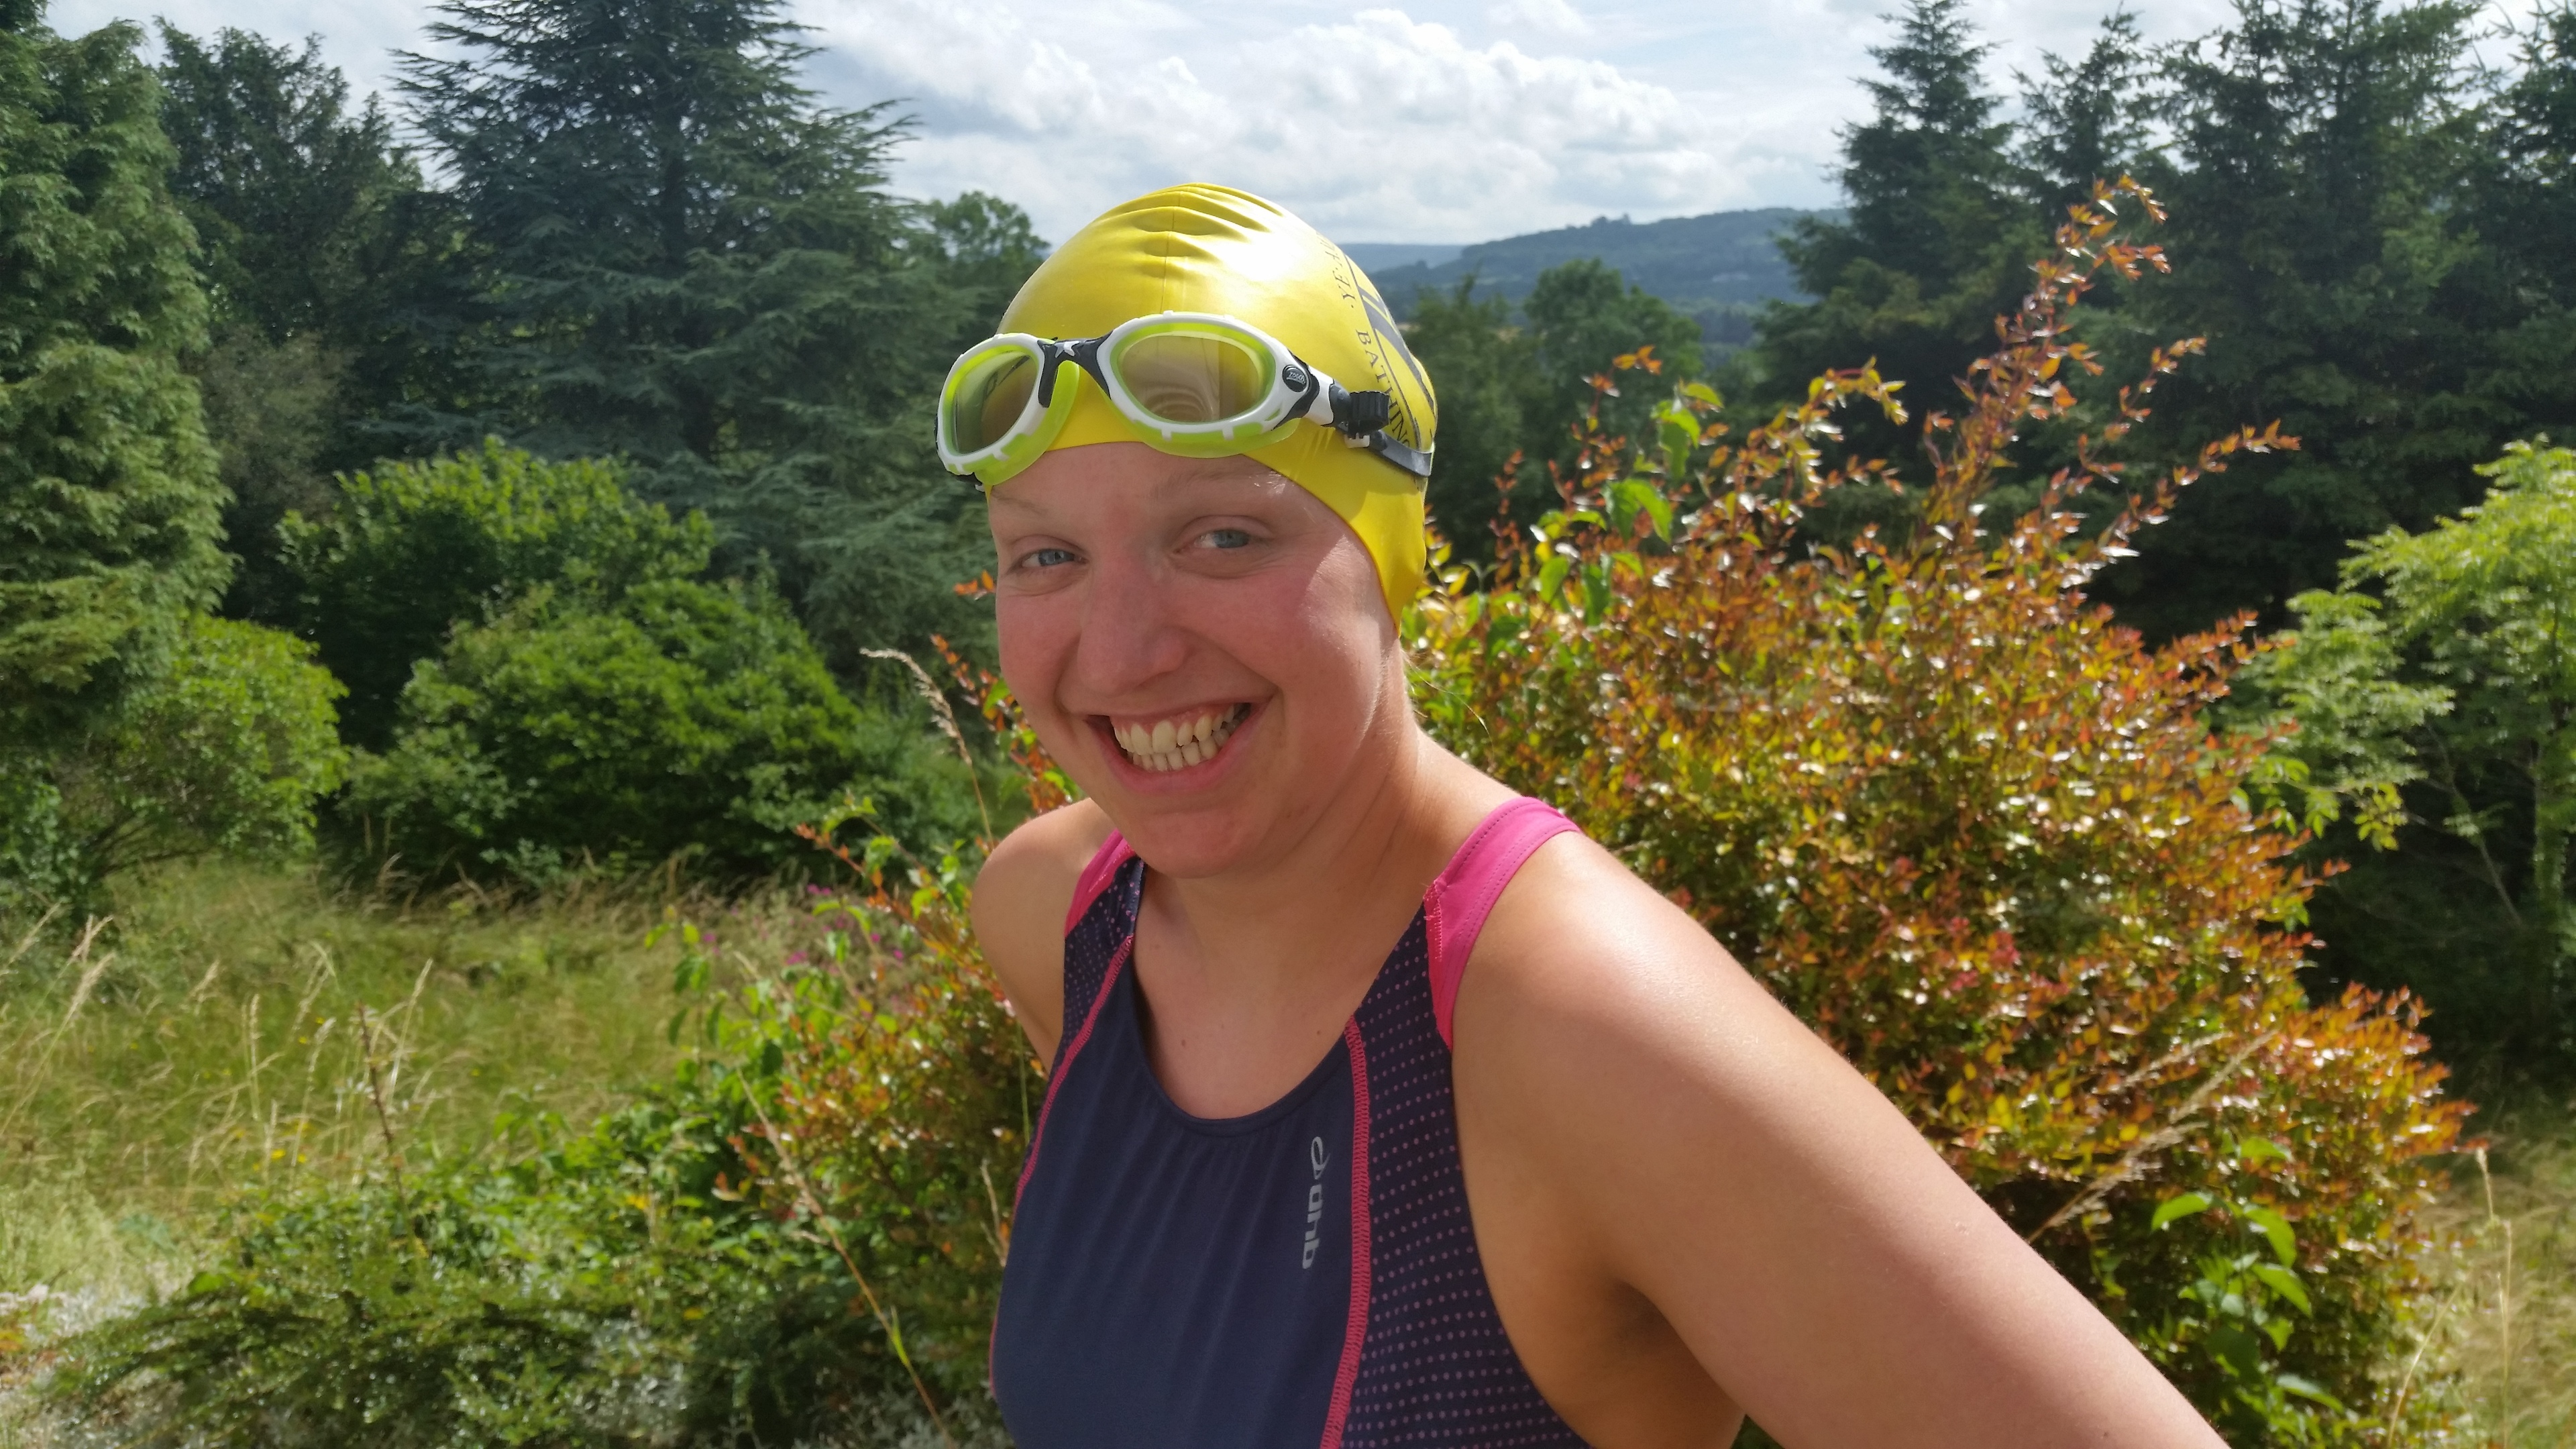 Mhairi Murdoch, wearing her Ye Amphibious Ancients Bathing Association swim cap